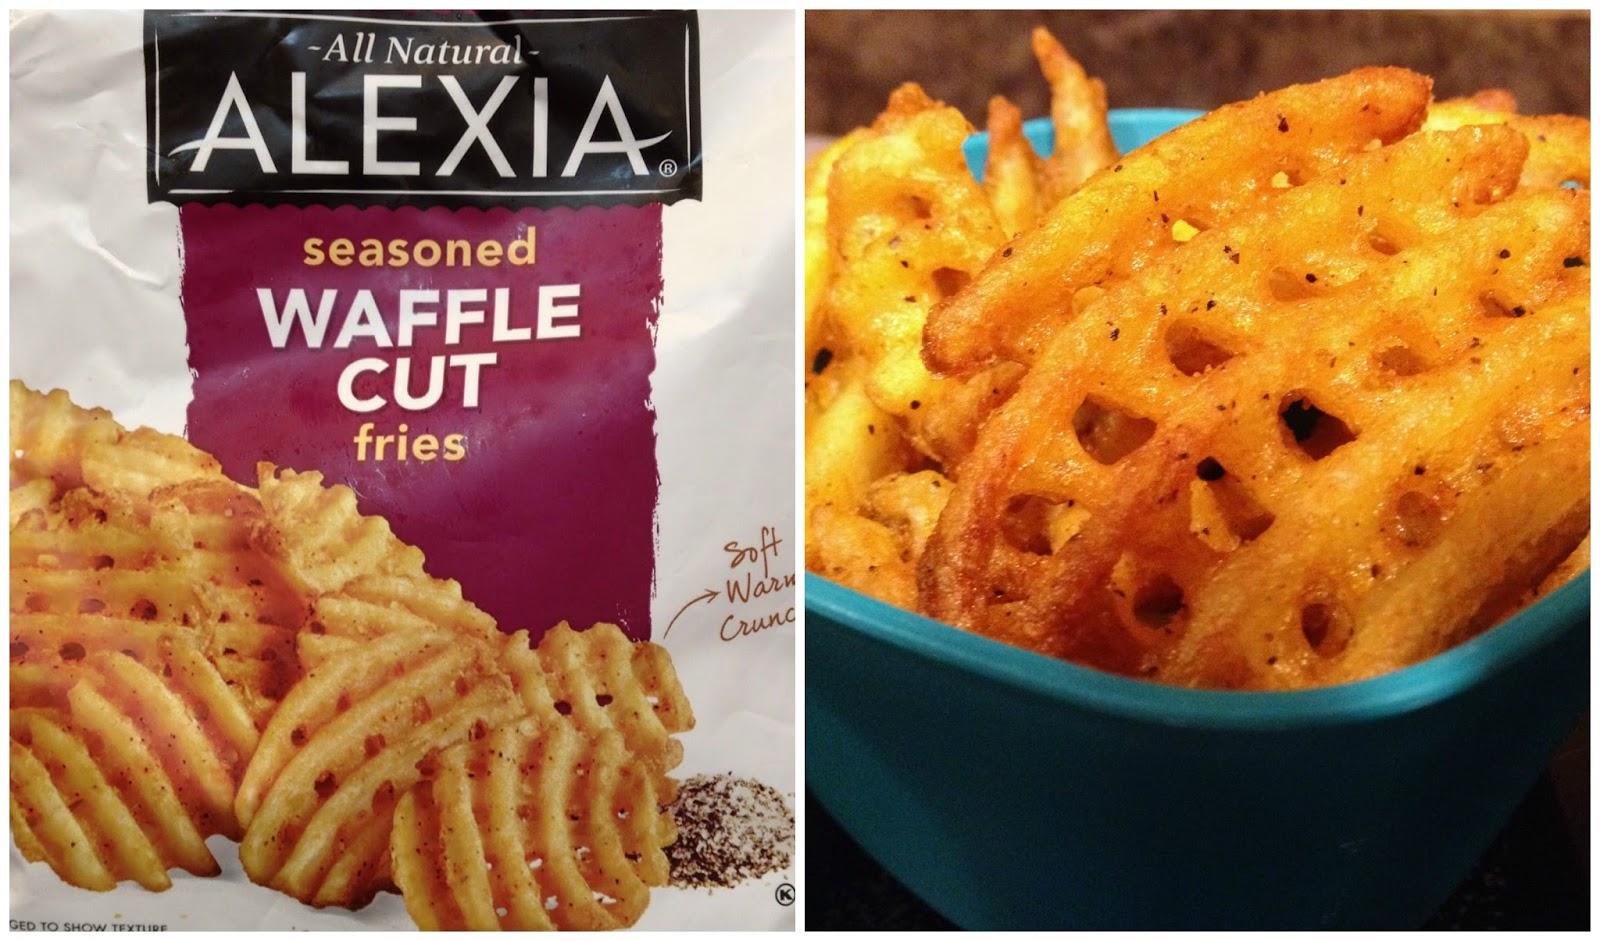 are alexia seasoned waffle cut fries gluten free